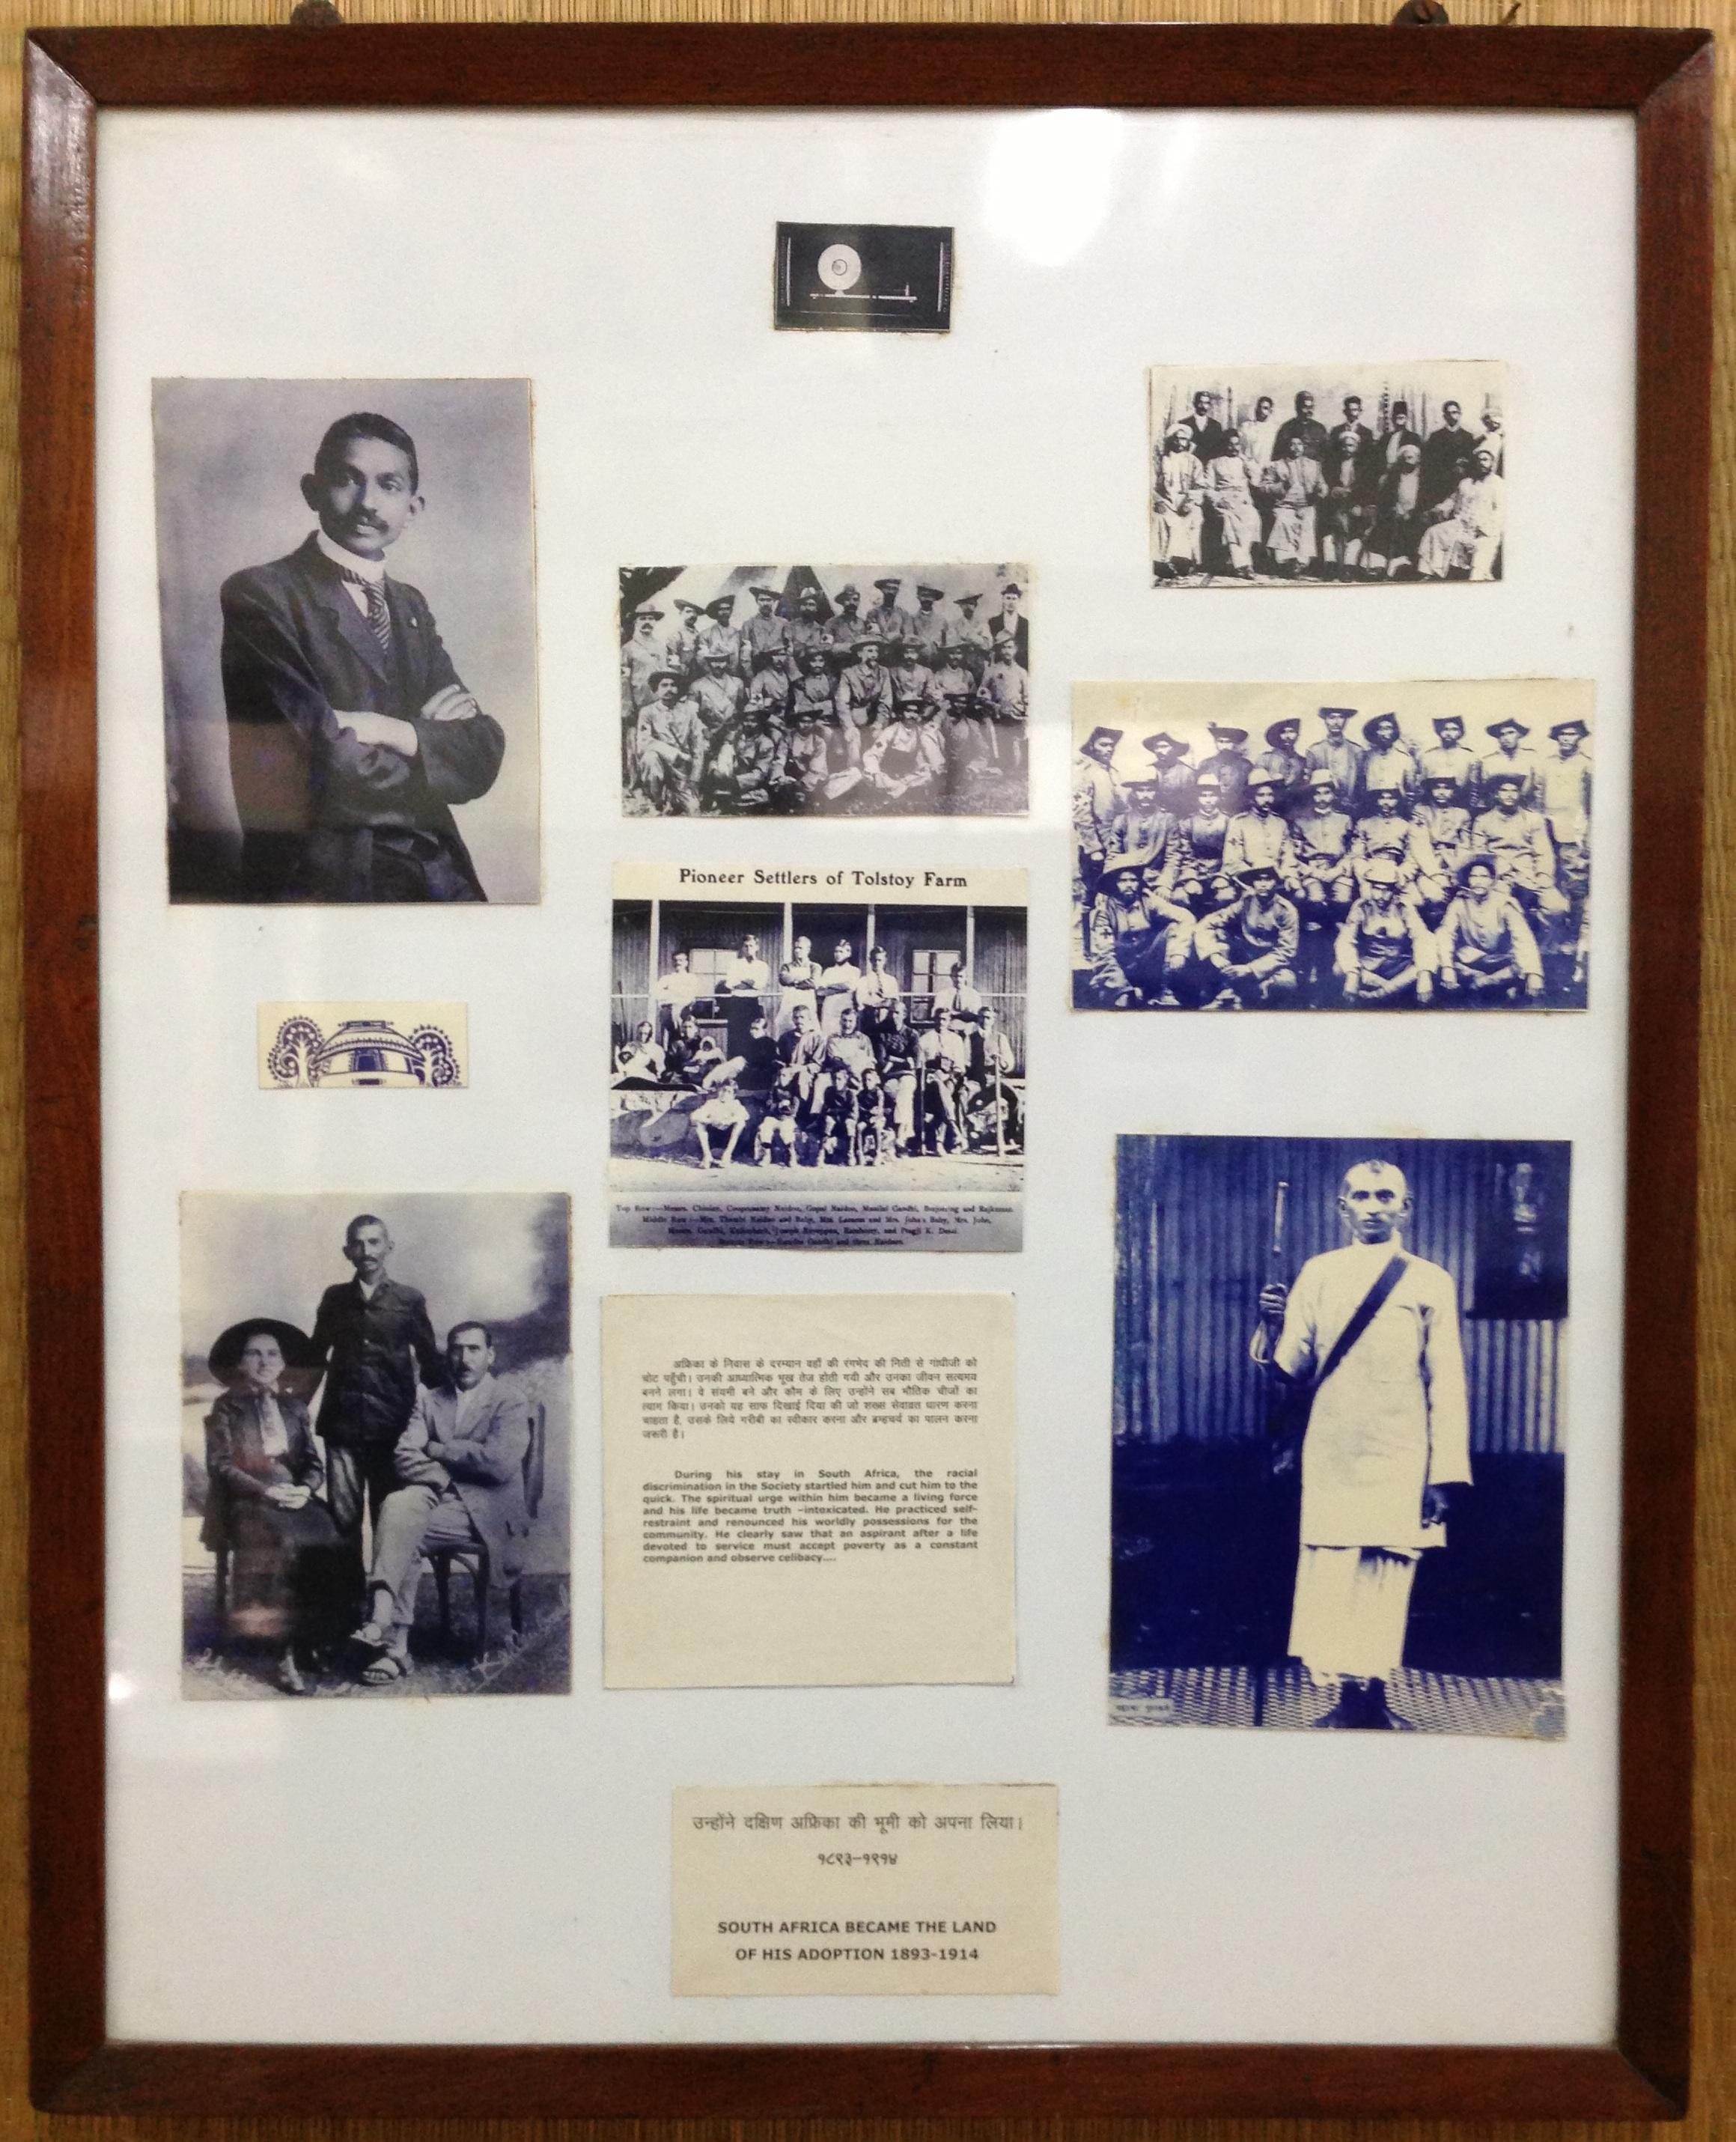 Mahatma Gandhi in South Africa - 1893-1914